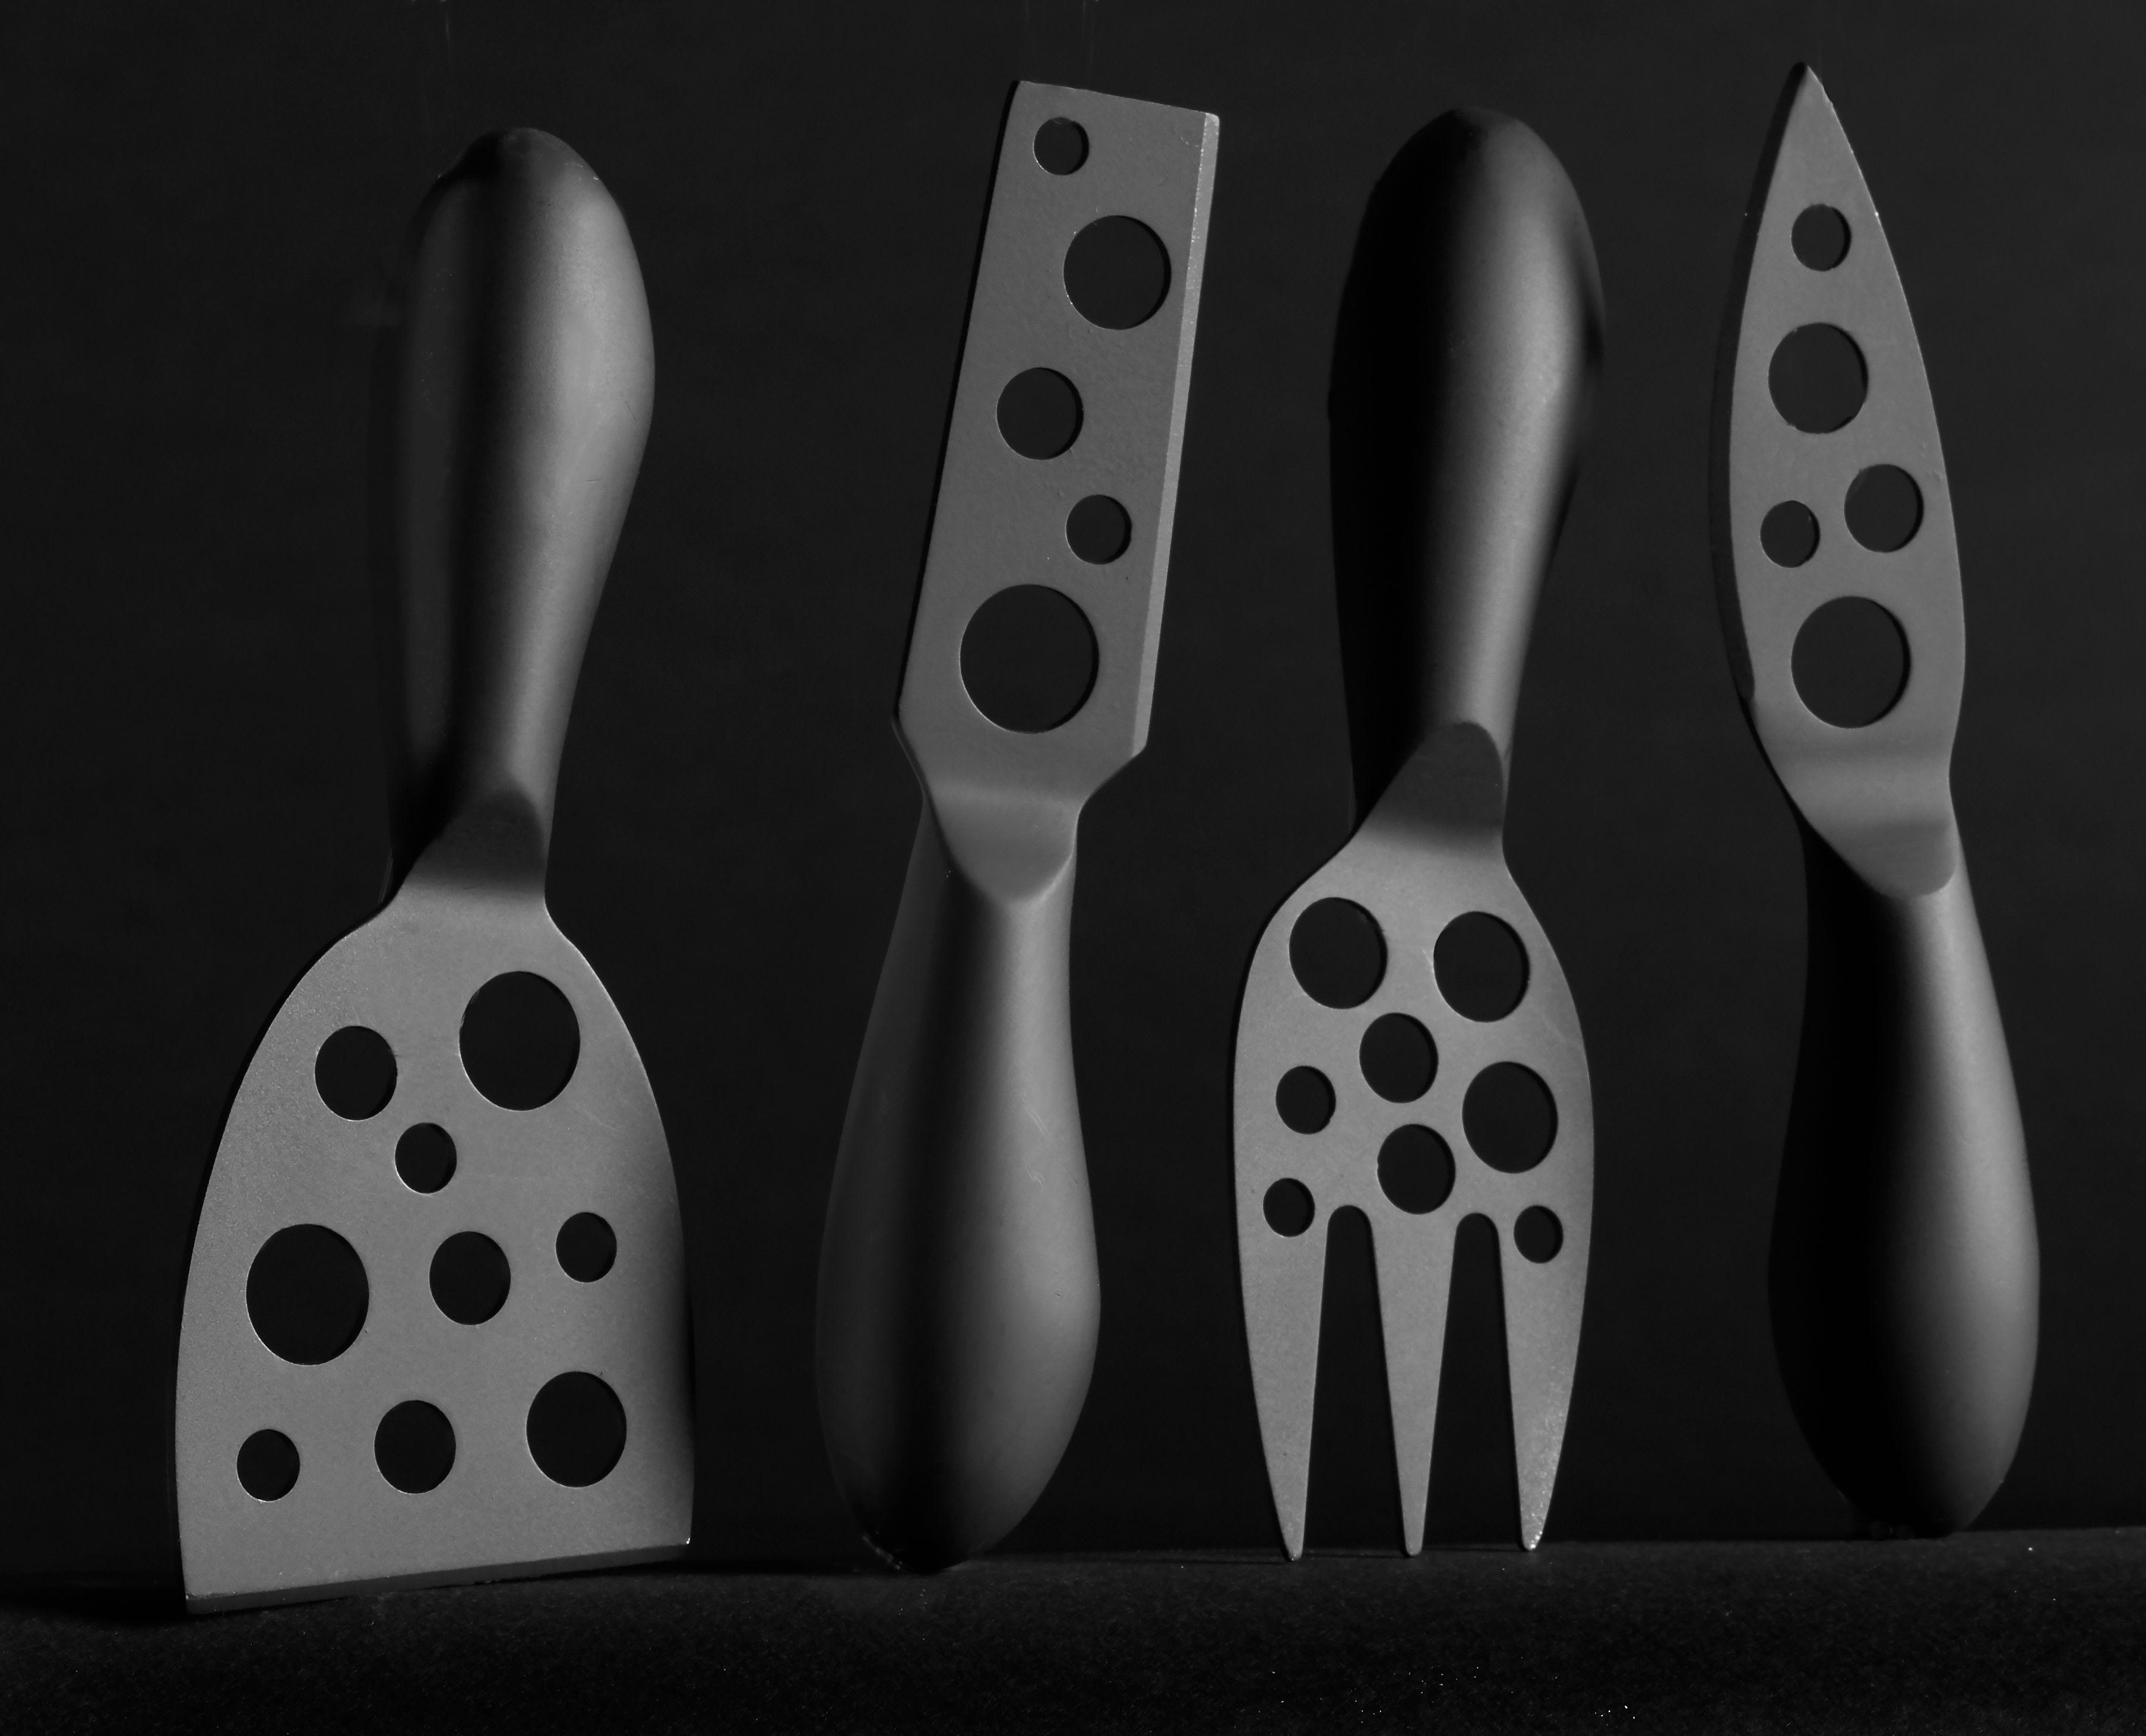 Knives_Black_Testing0165.jpg